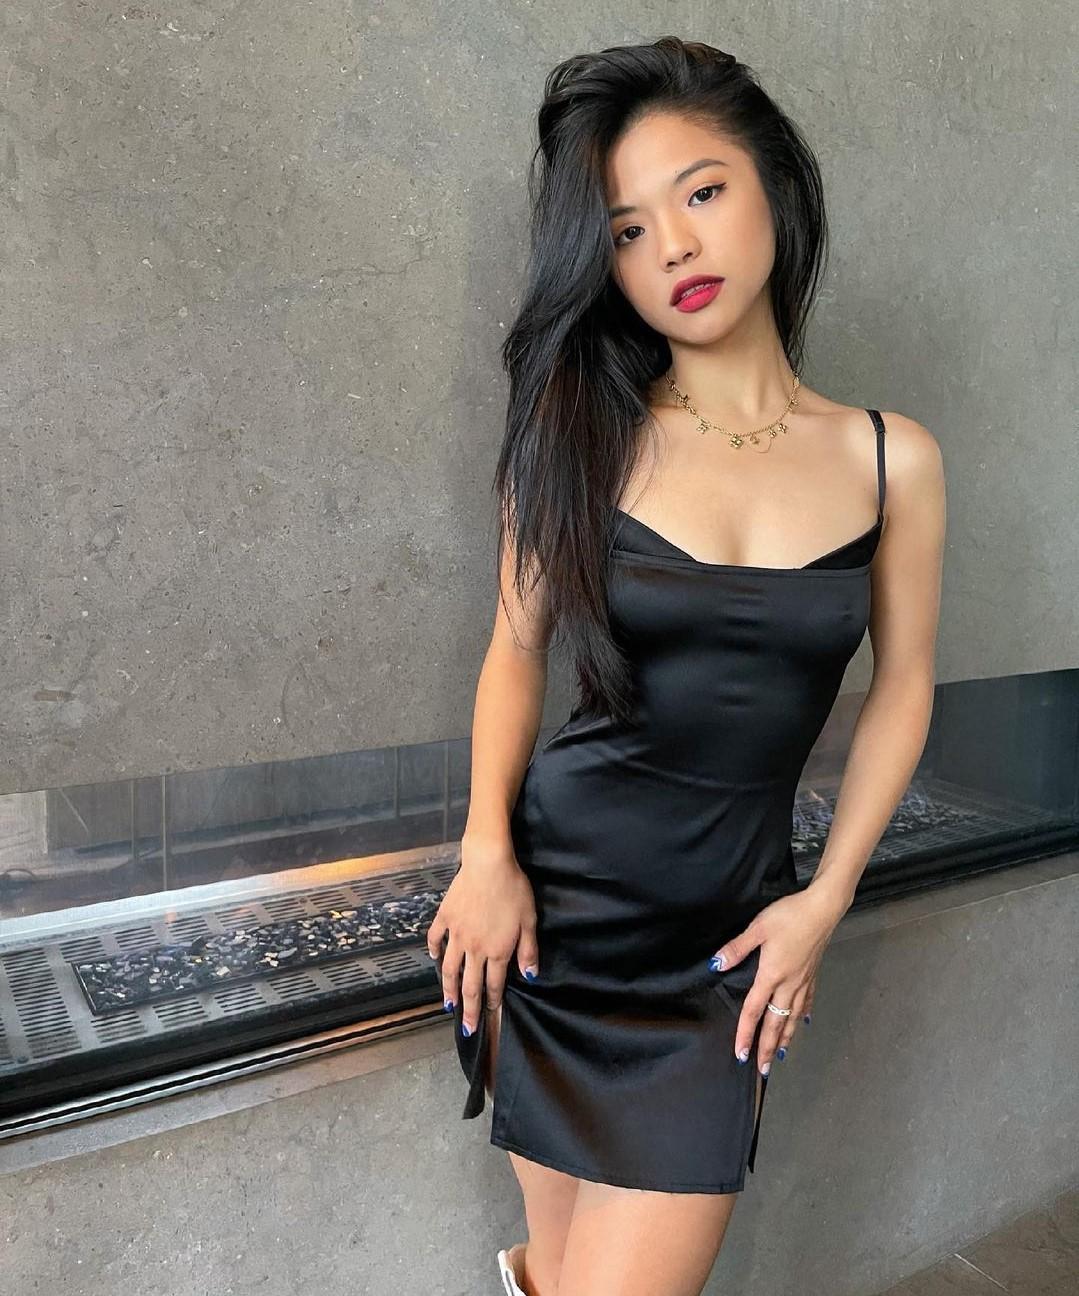 Brunette Asian Bride